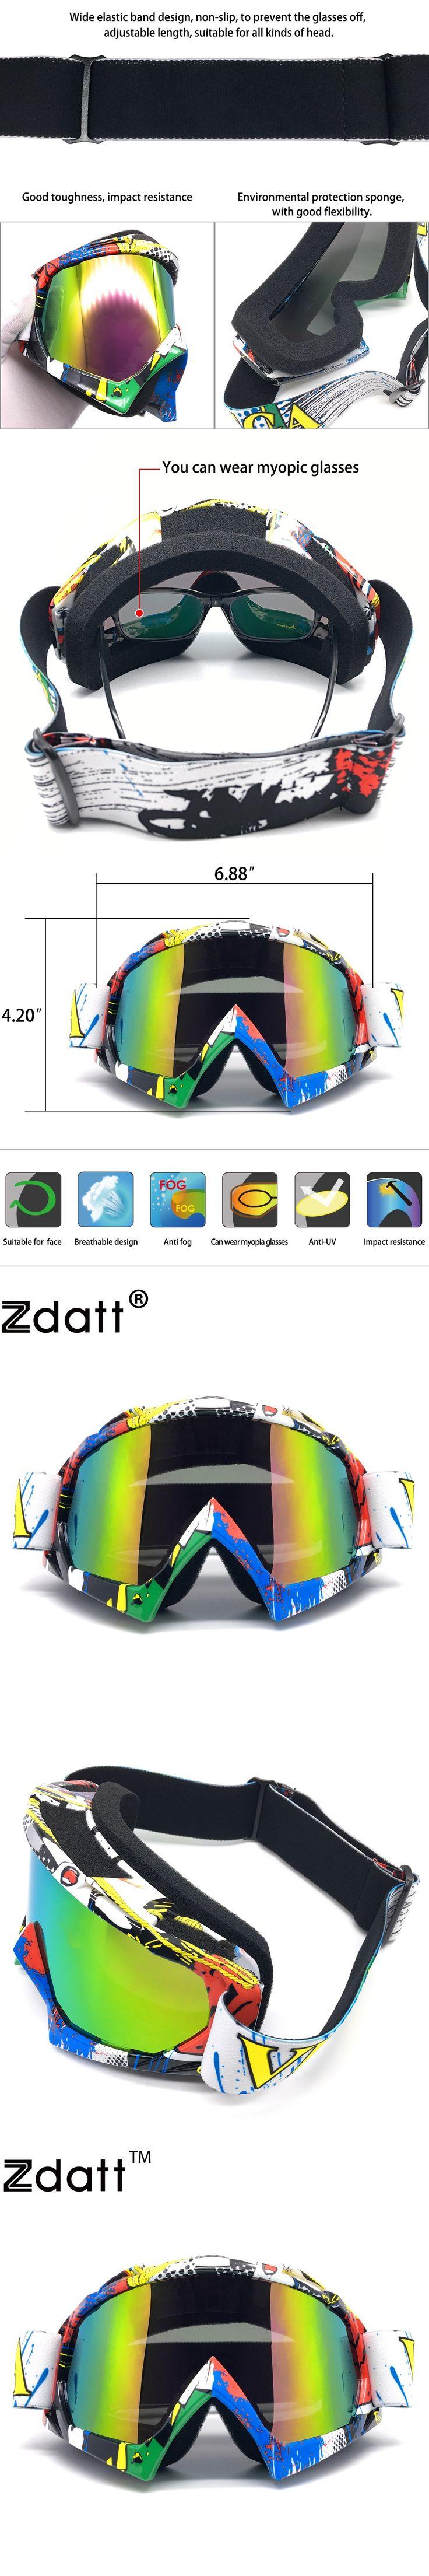 Zdatt 1Pcs Motocross Motorcycle Goggles Moto Glasses Fox Racing Ski Goggles Windproof Mx Goggles Antiparras 03